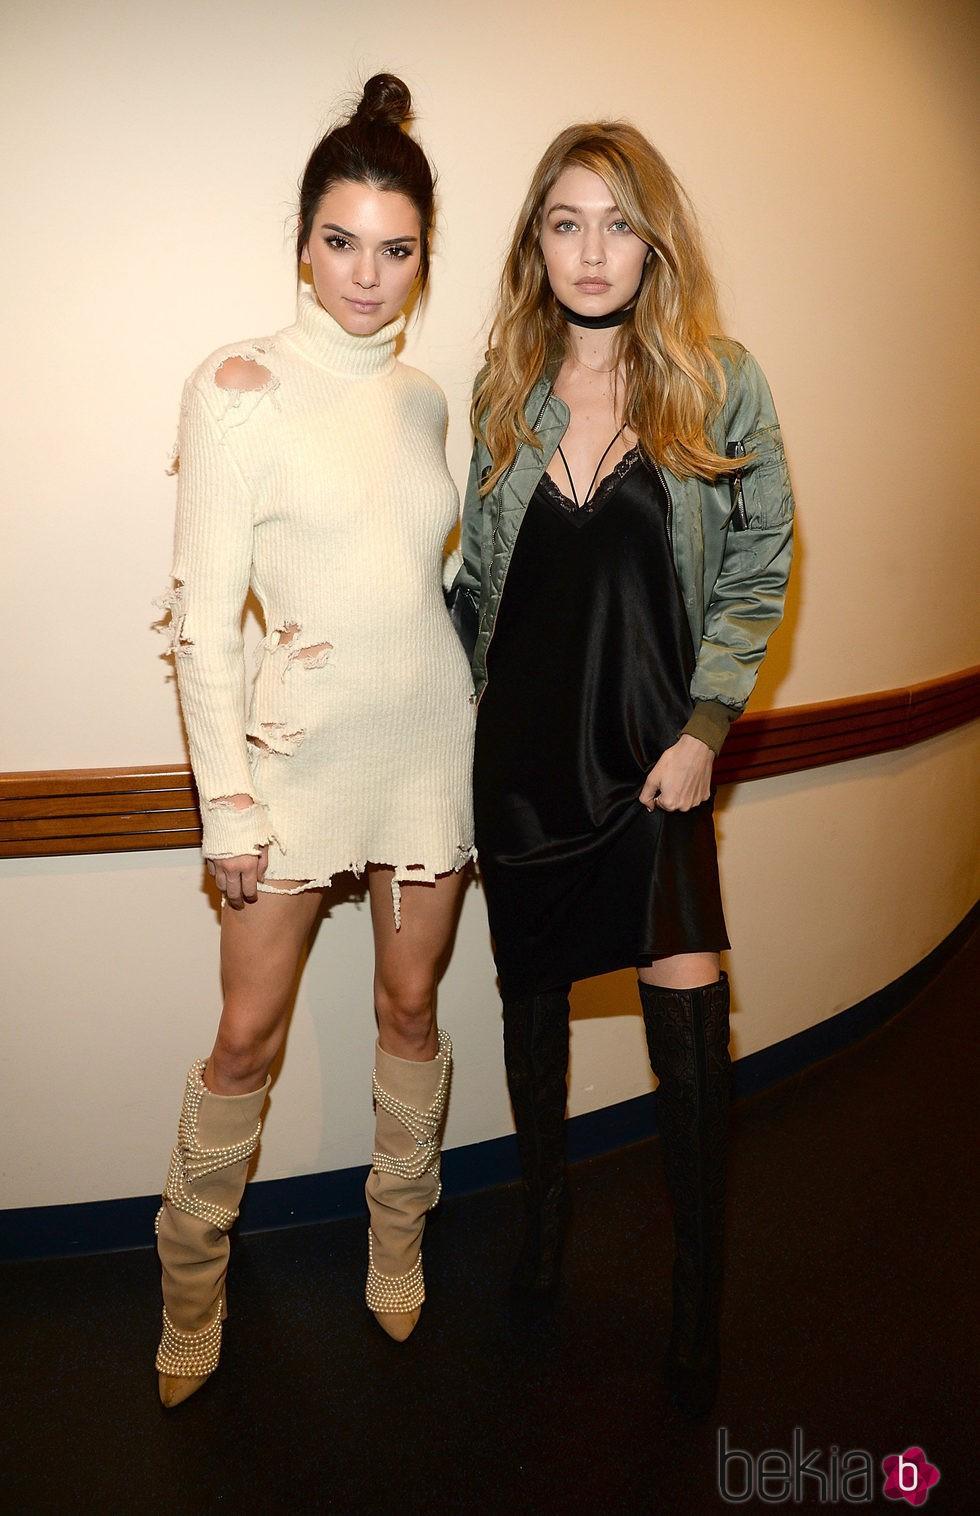 Kendall Jenner y Gigi Hadid en el desfile de Kanye West 'Yeezy Season 3'